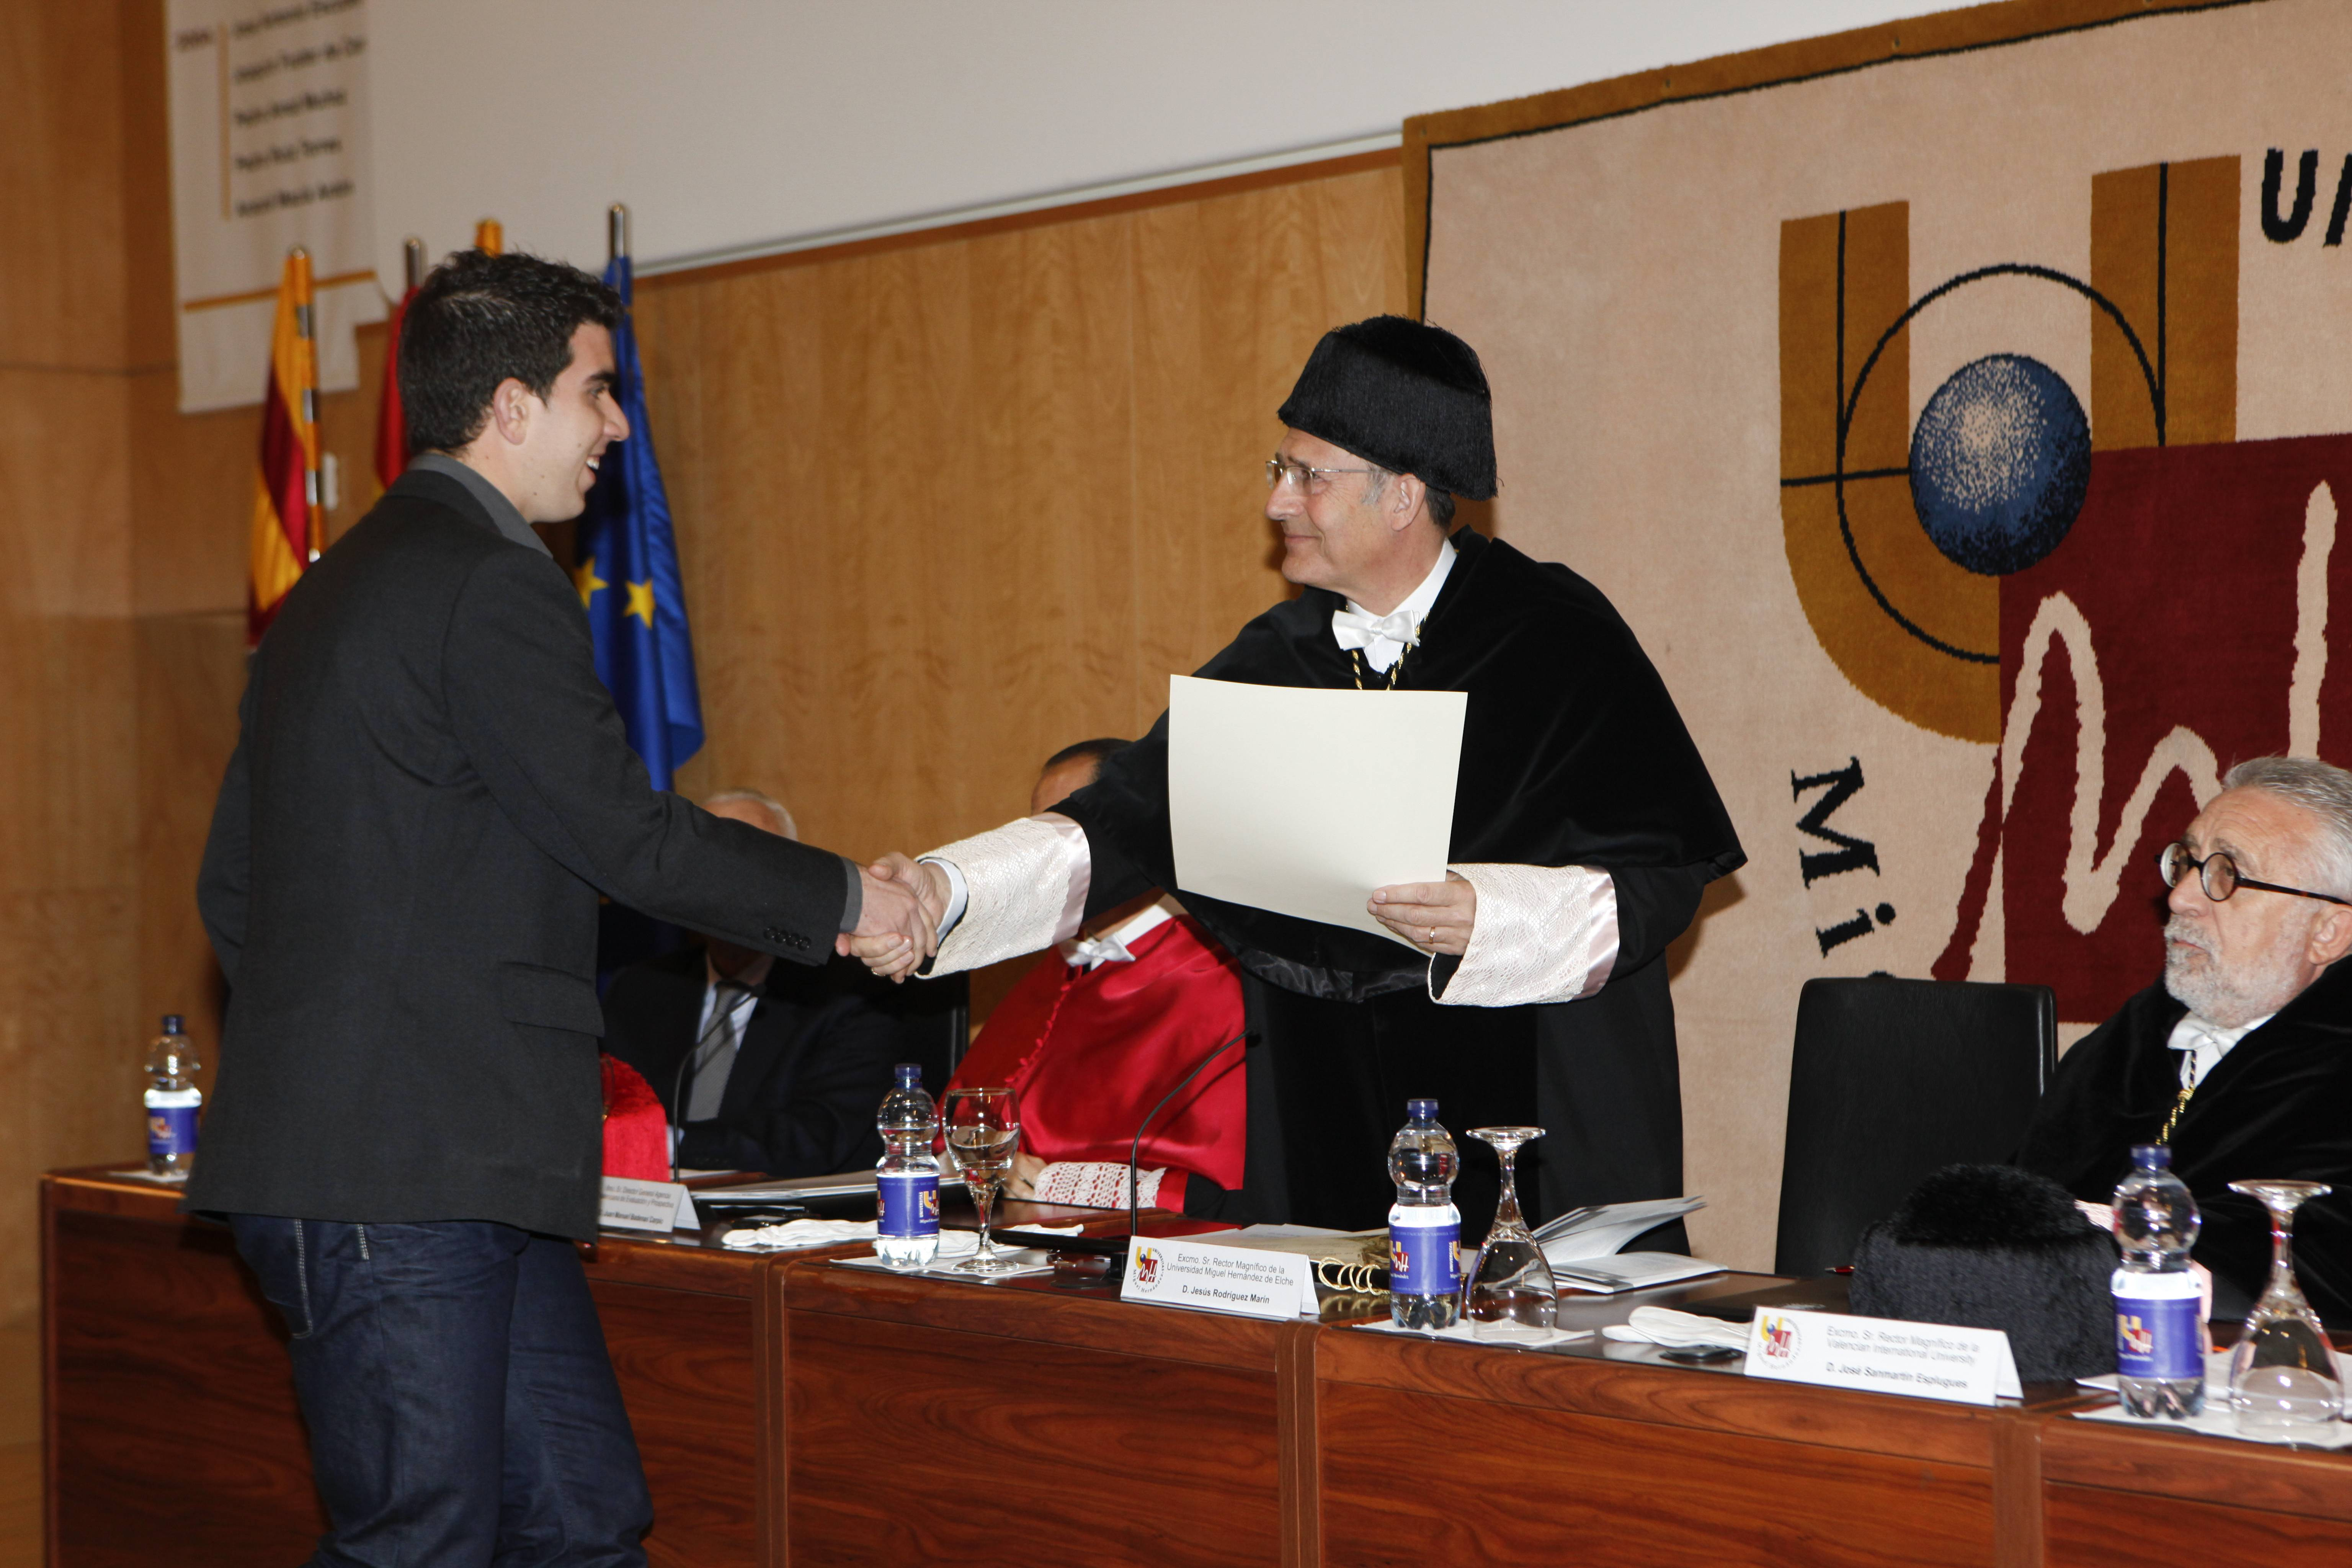 doctor-honoris-causa-luis-gamir_mg_0948.jpg